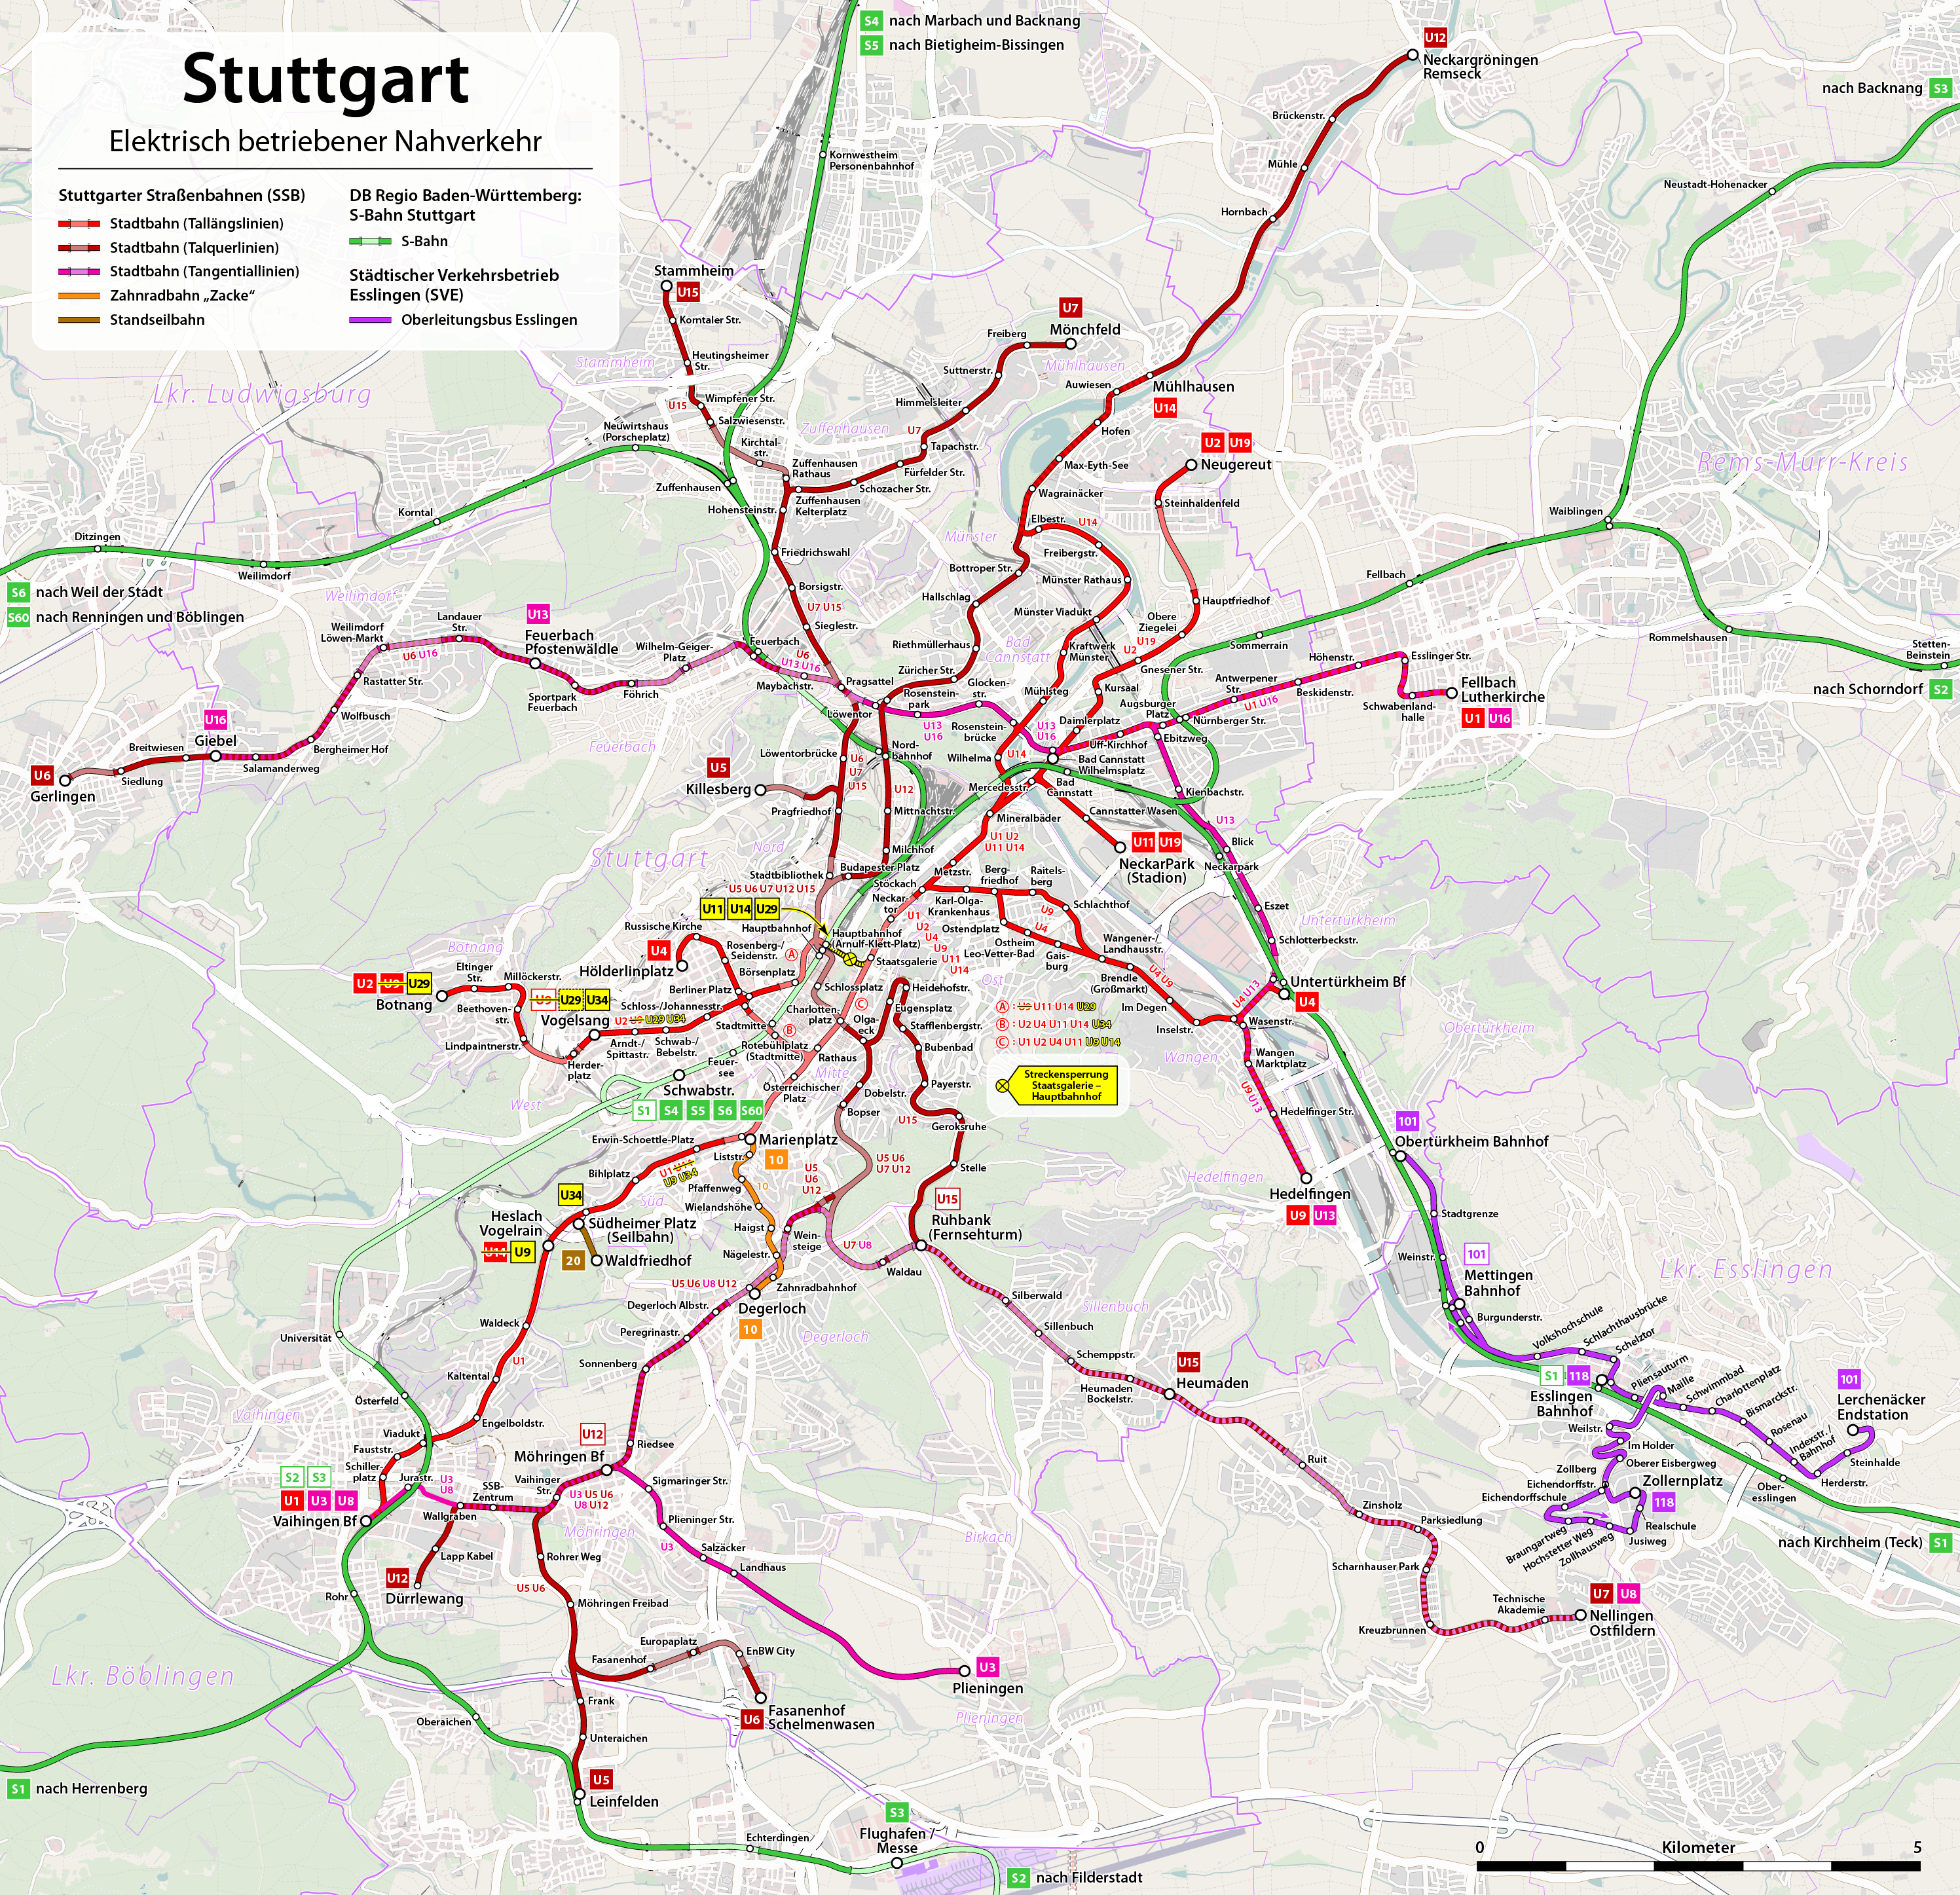 Stadtbahn stuttgart wikiwand for Who is perfect stuttgart